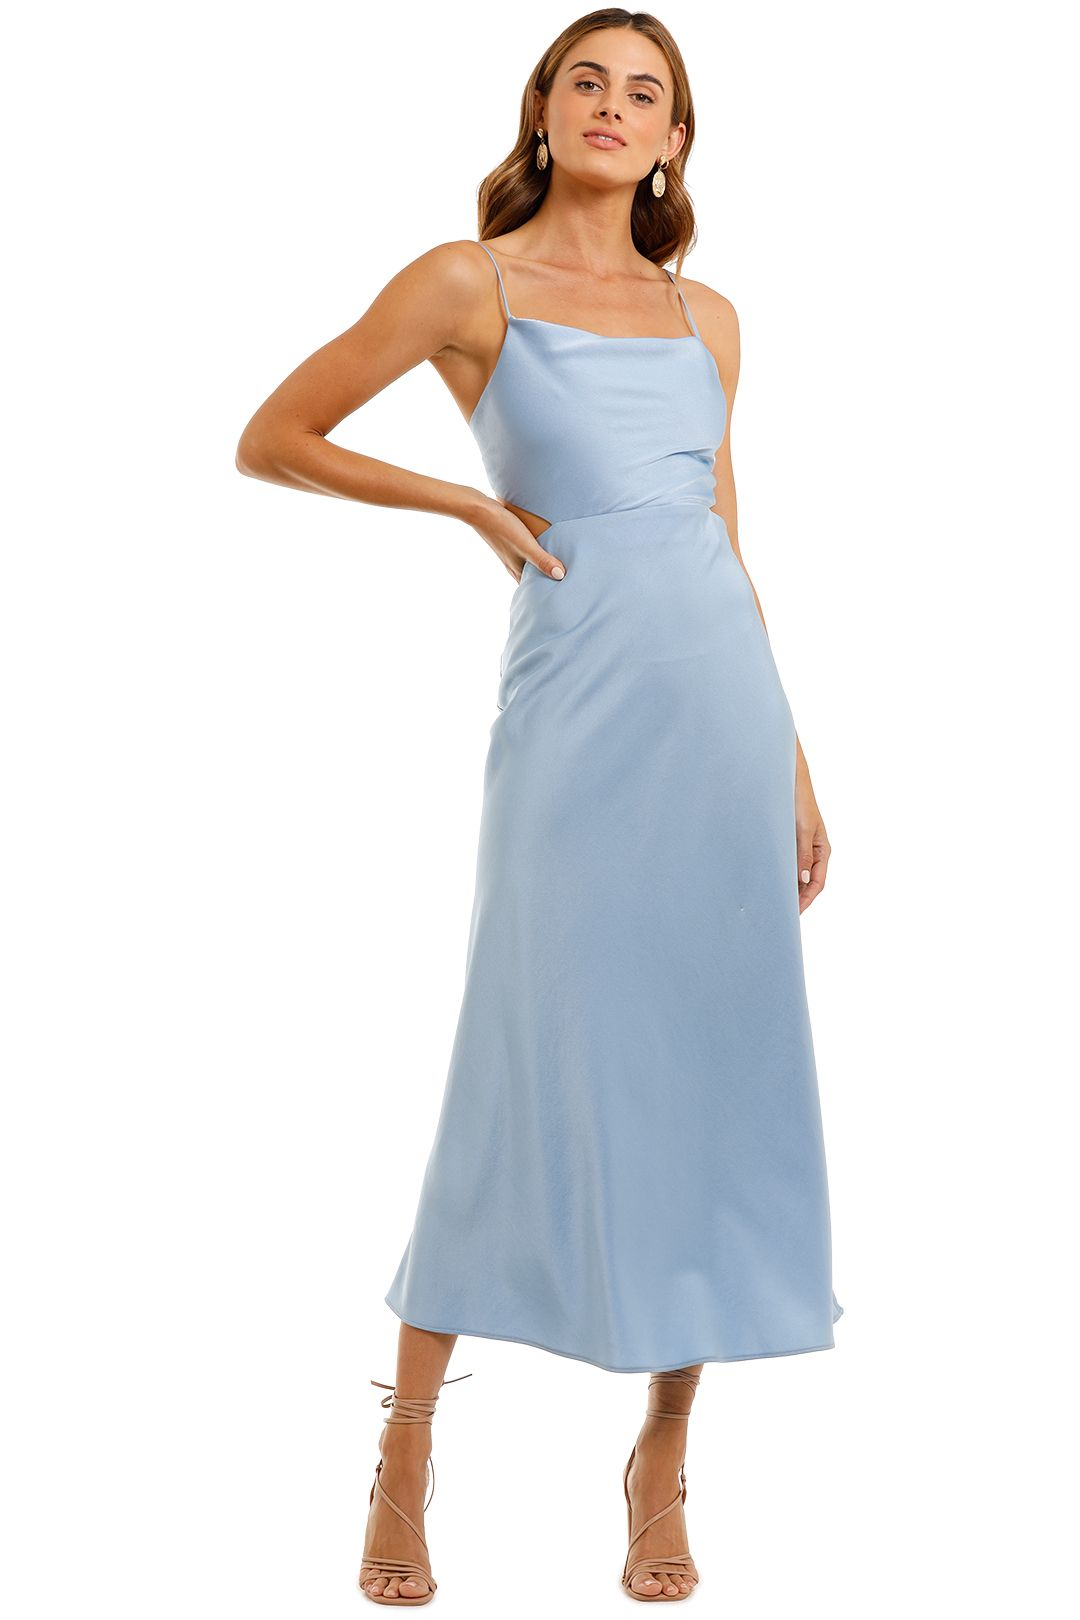 Bec and Bridge Raquel Baby Blue Midi Dress